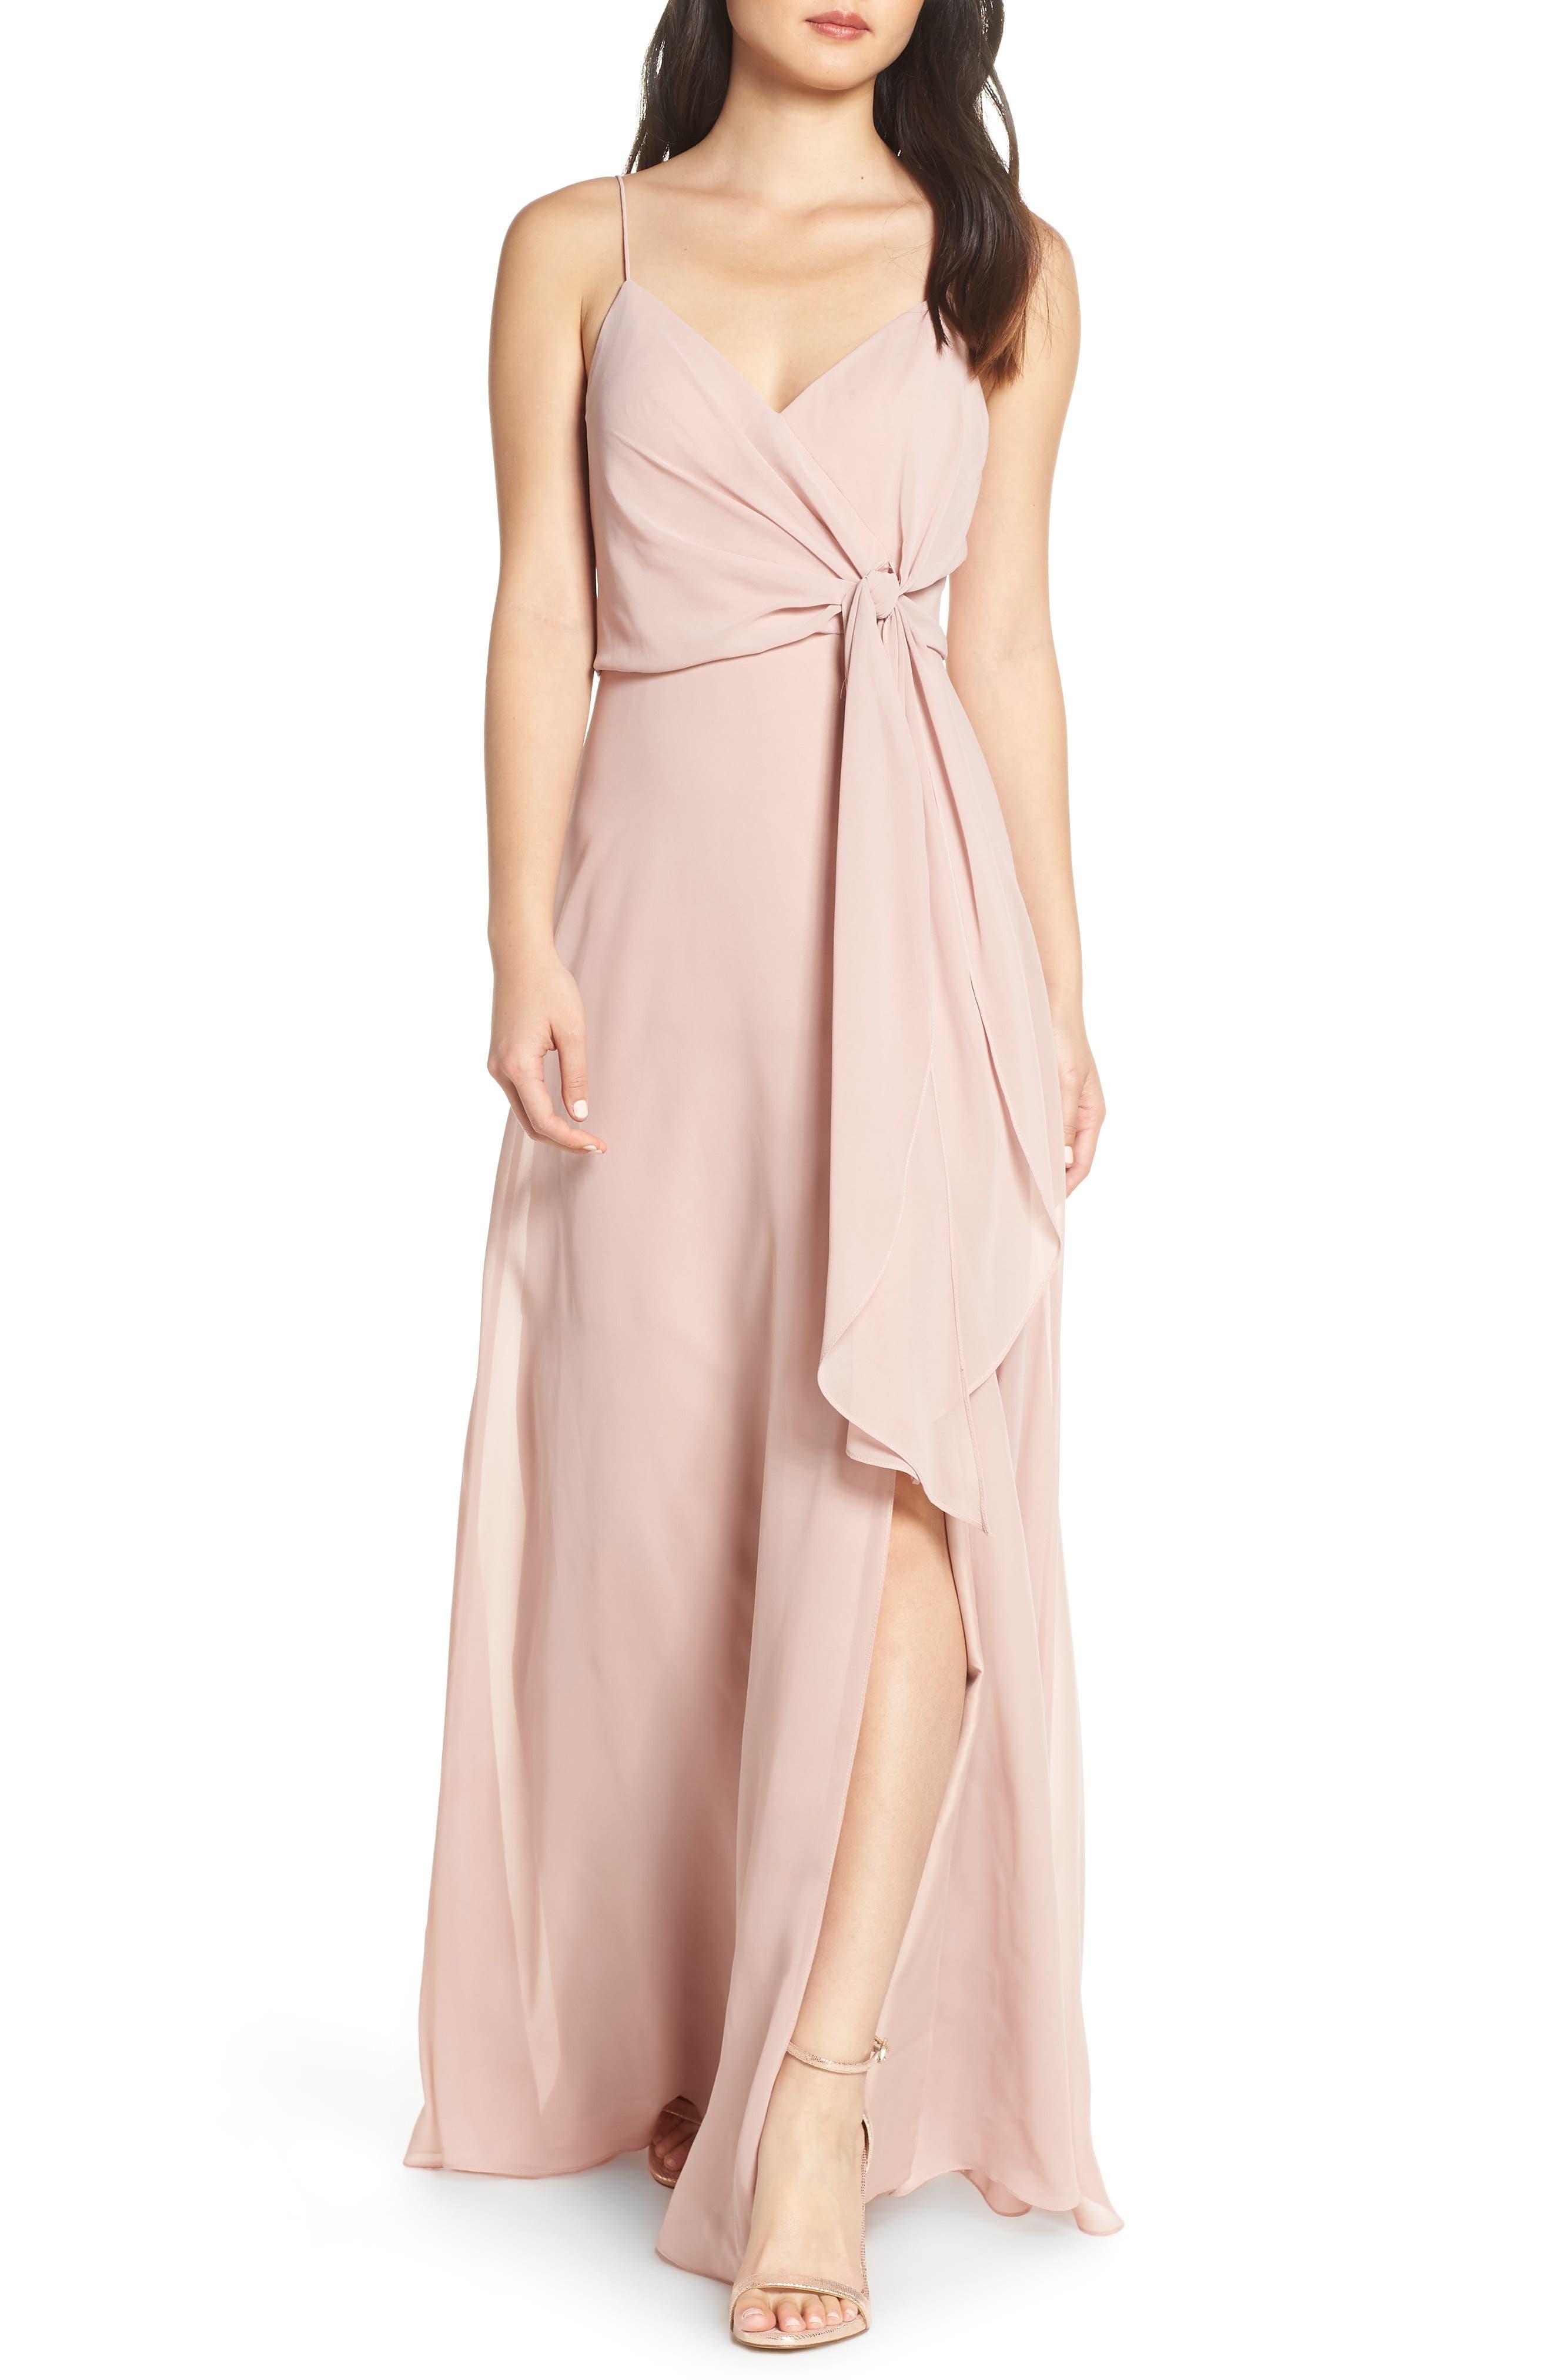 Jenny Yoo Amara Chiffon Overlay V-Neck Evening Dress, Red